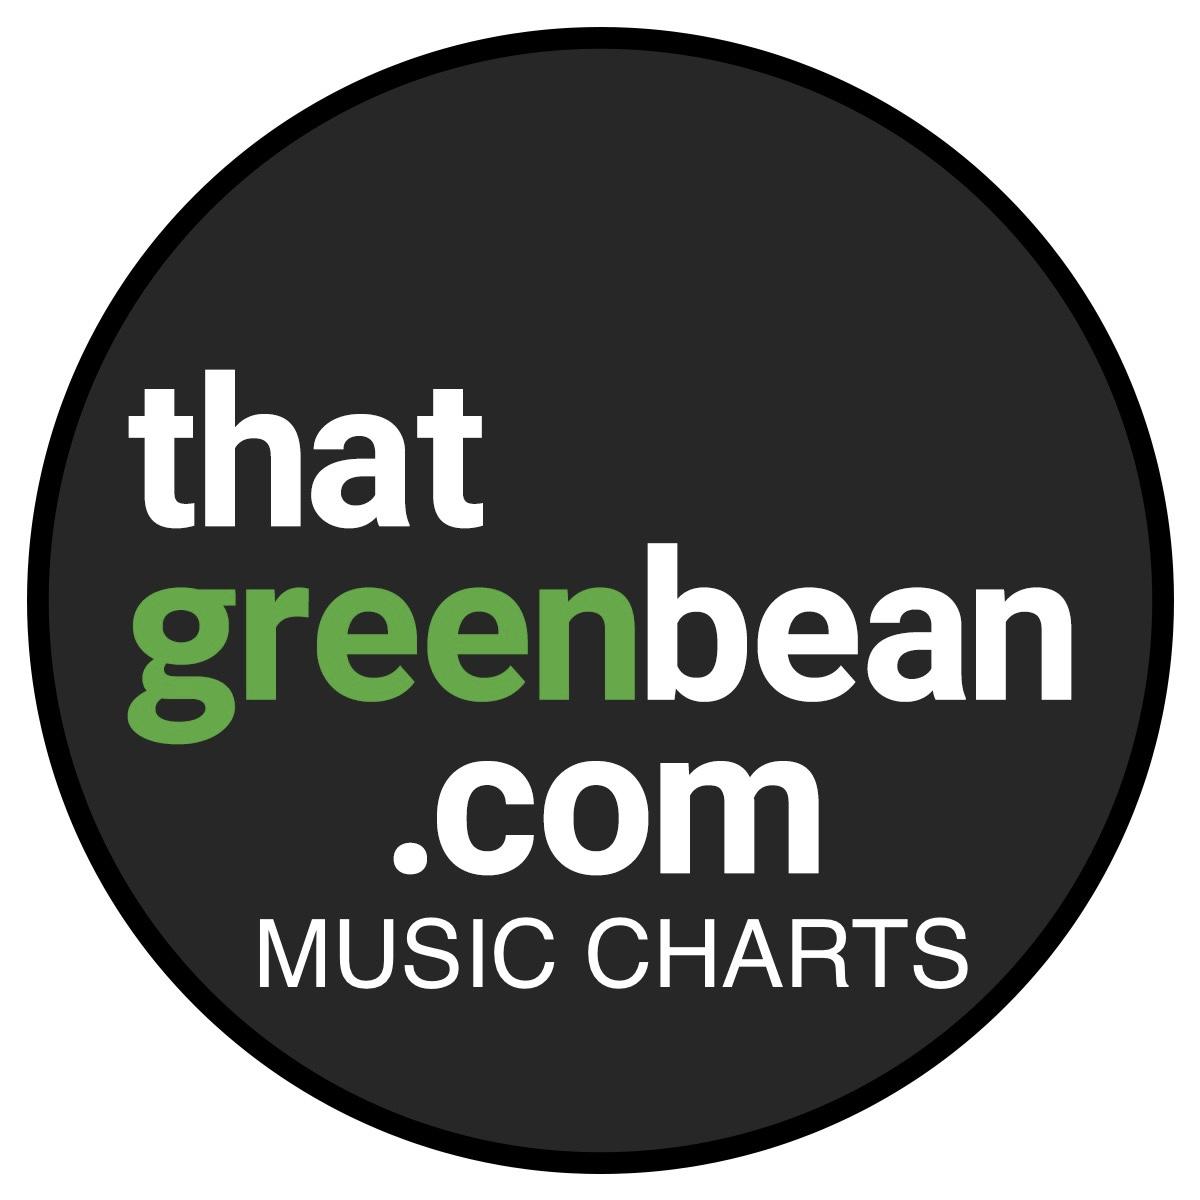 THAT GREEN BEAN